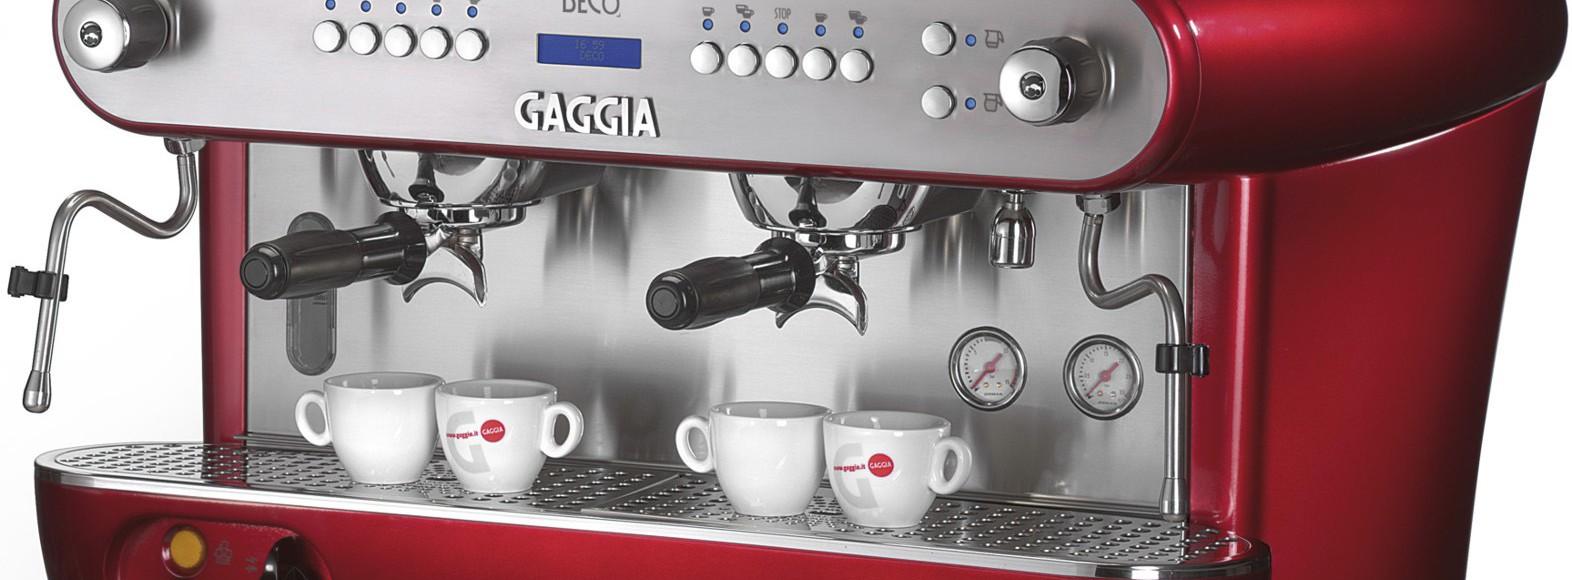 saeco-profissional-cafexpresso